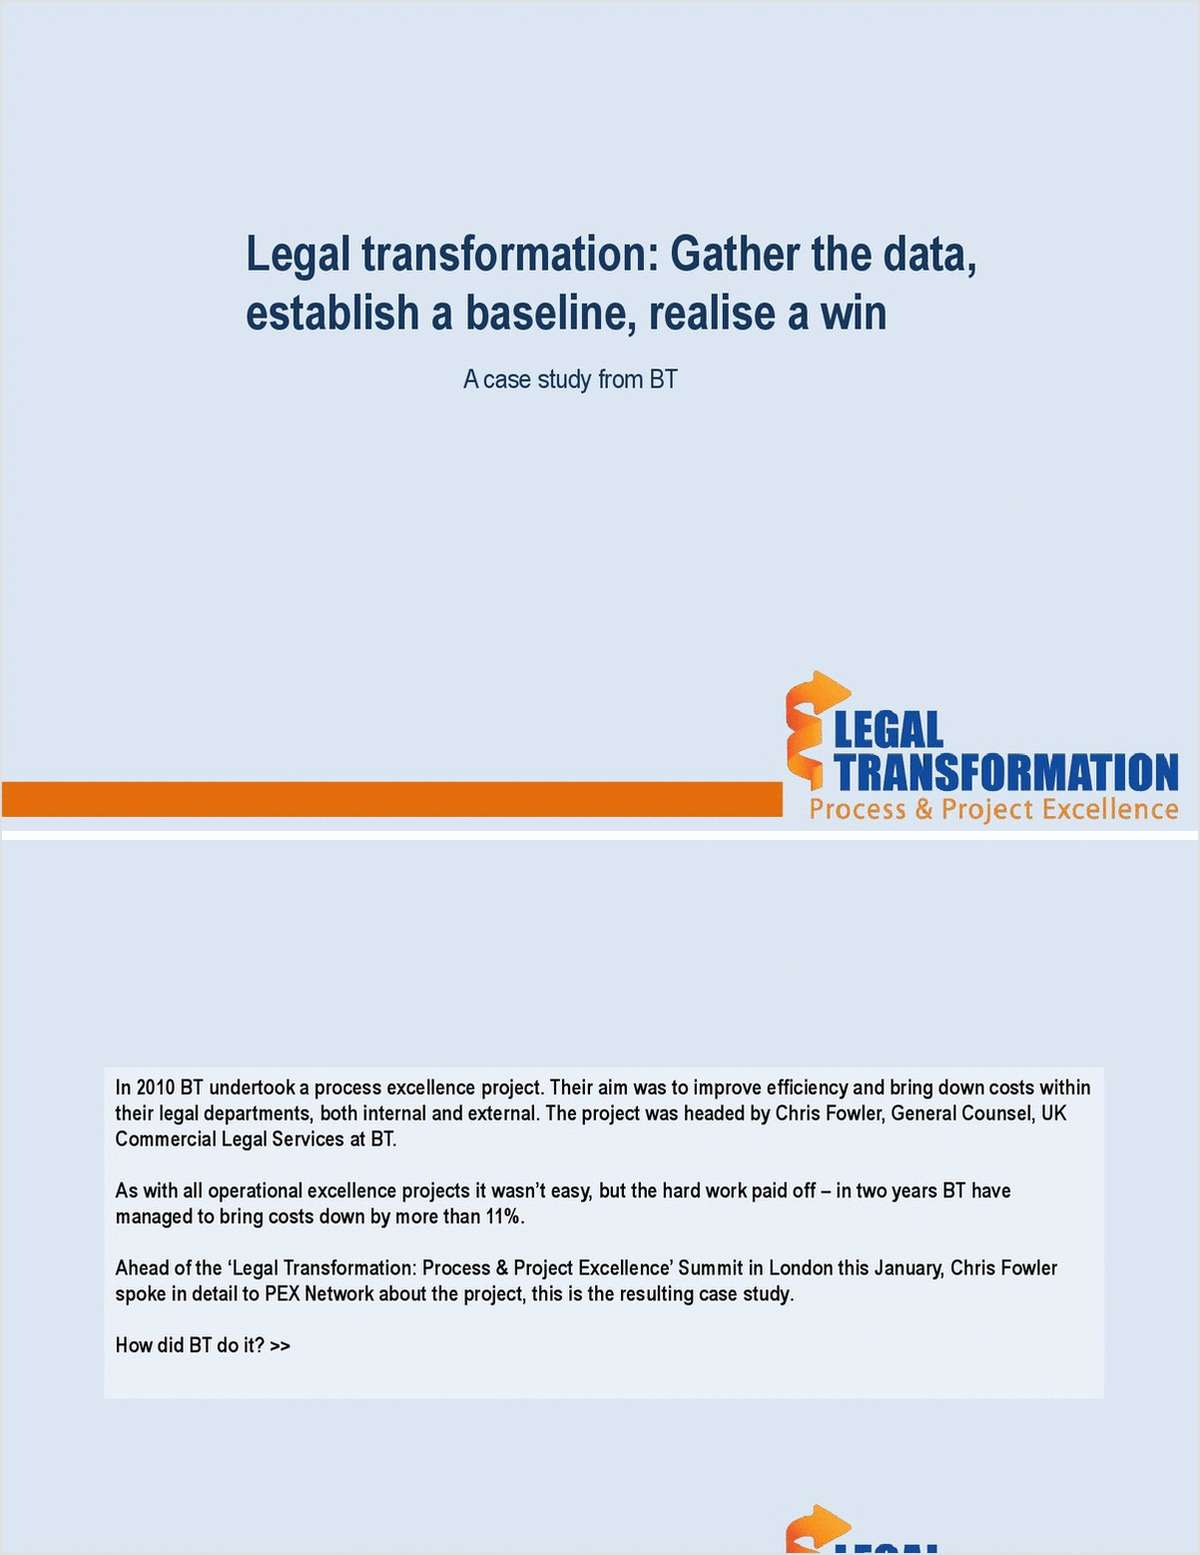 Legal transformation: Gather the data, establish a baseline, realise a win